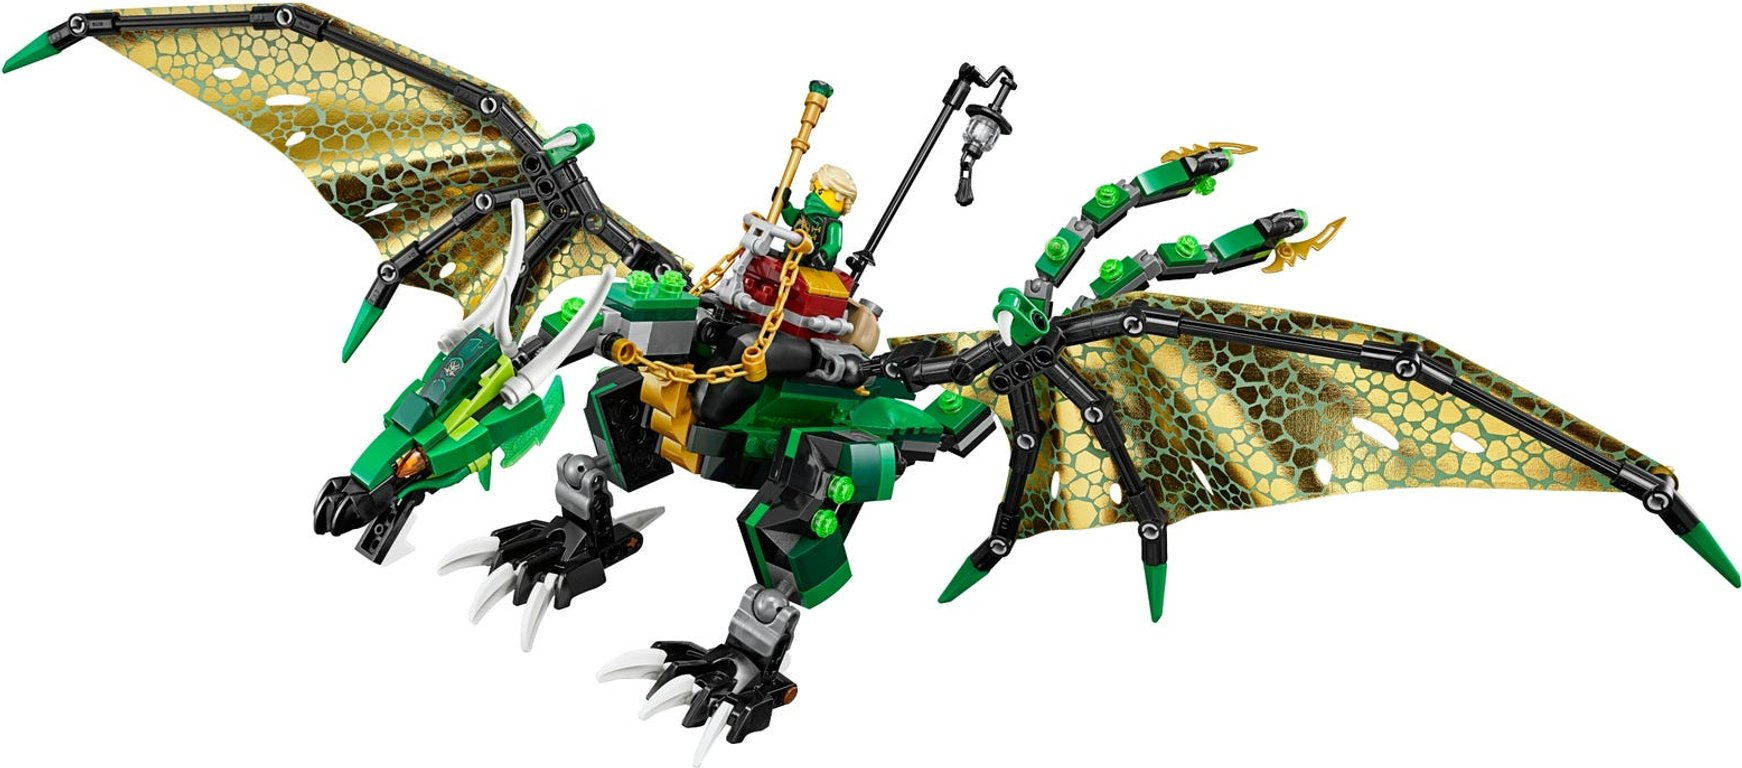 LEGO® Ninjago The Green NRG Dragon components